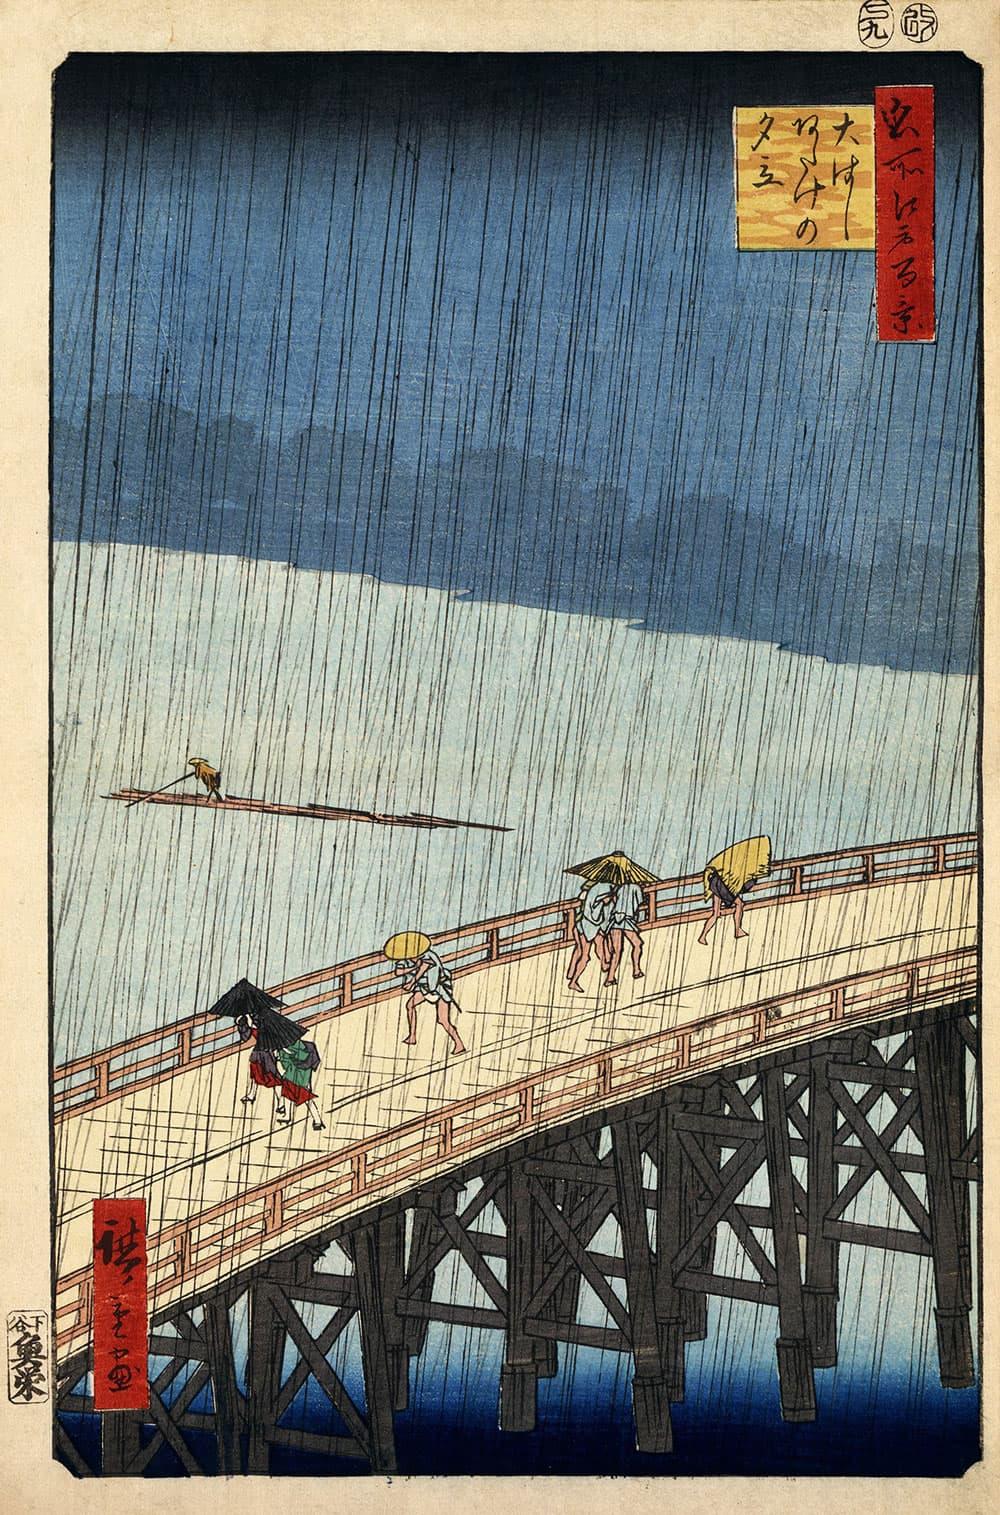 Sudden Shower over Shin-Ōhashi bridge and Atake (1857) by Hiroshige